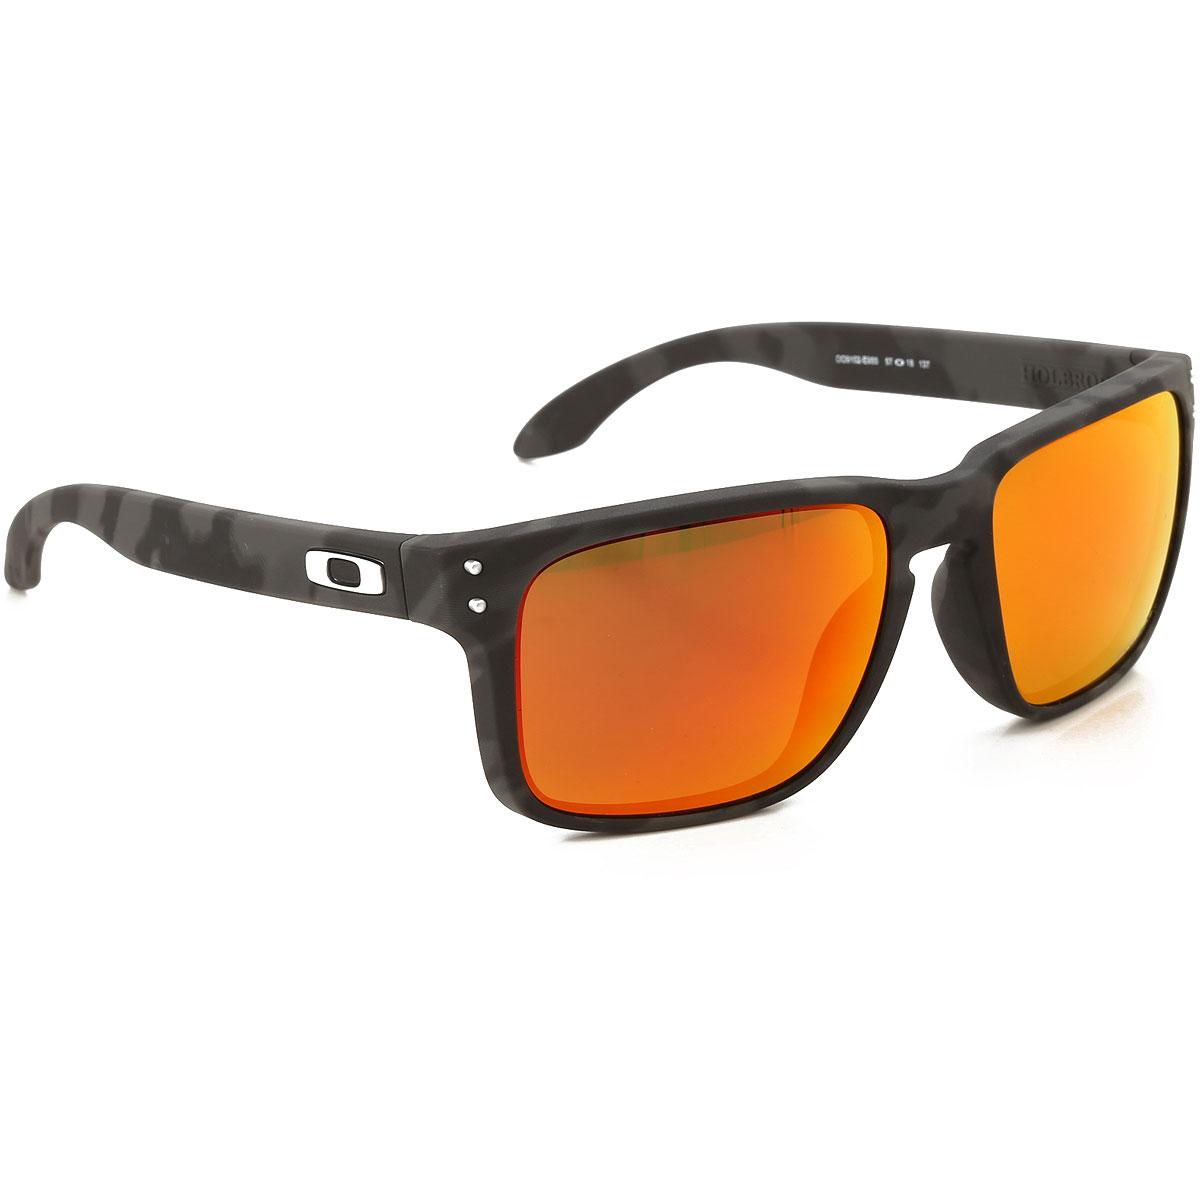 Oakley Sunglasses On Sale, Matt Black Camouflage, 2019